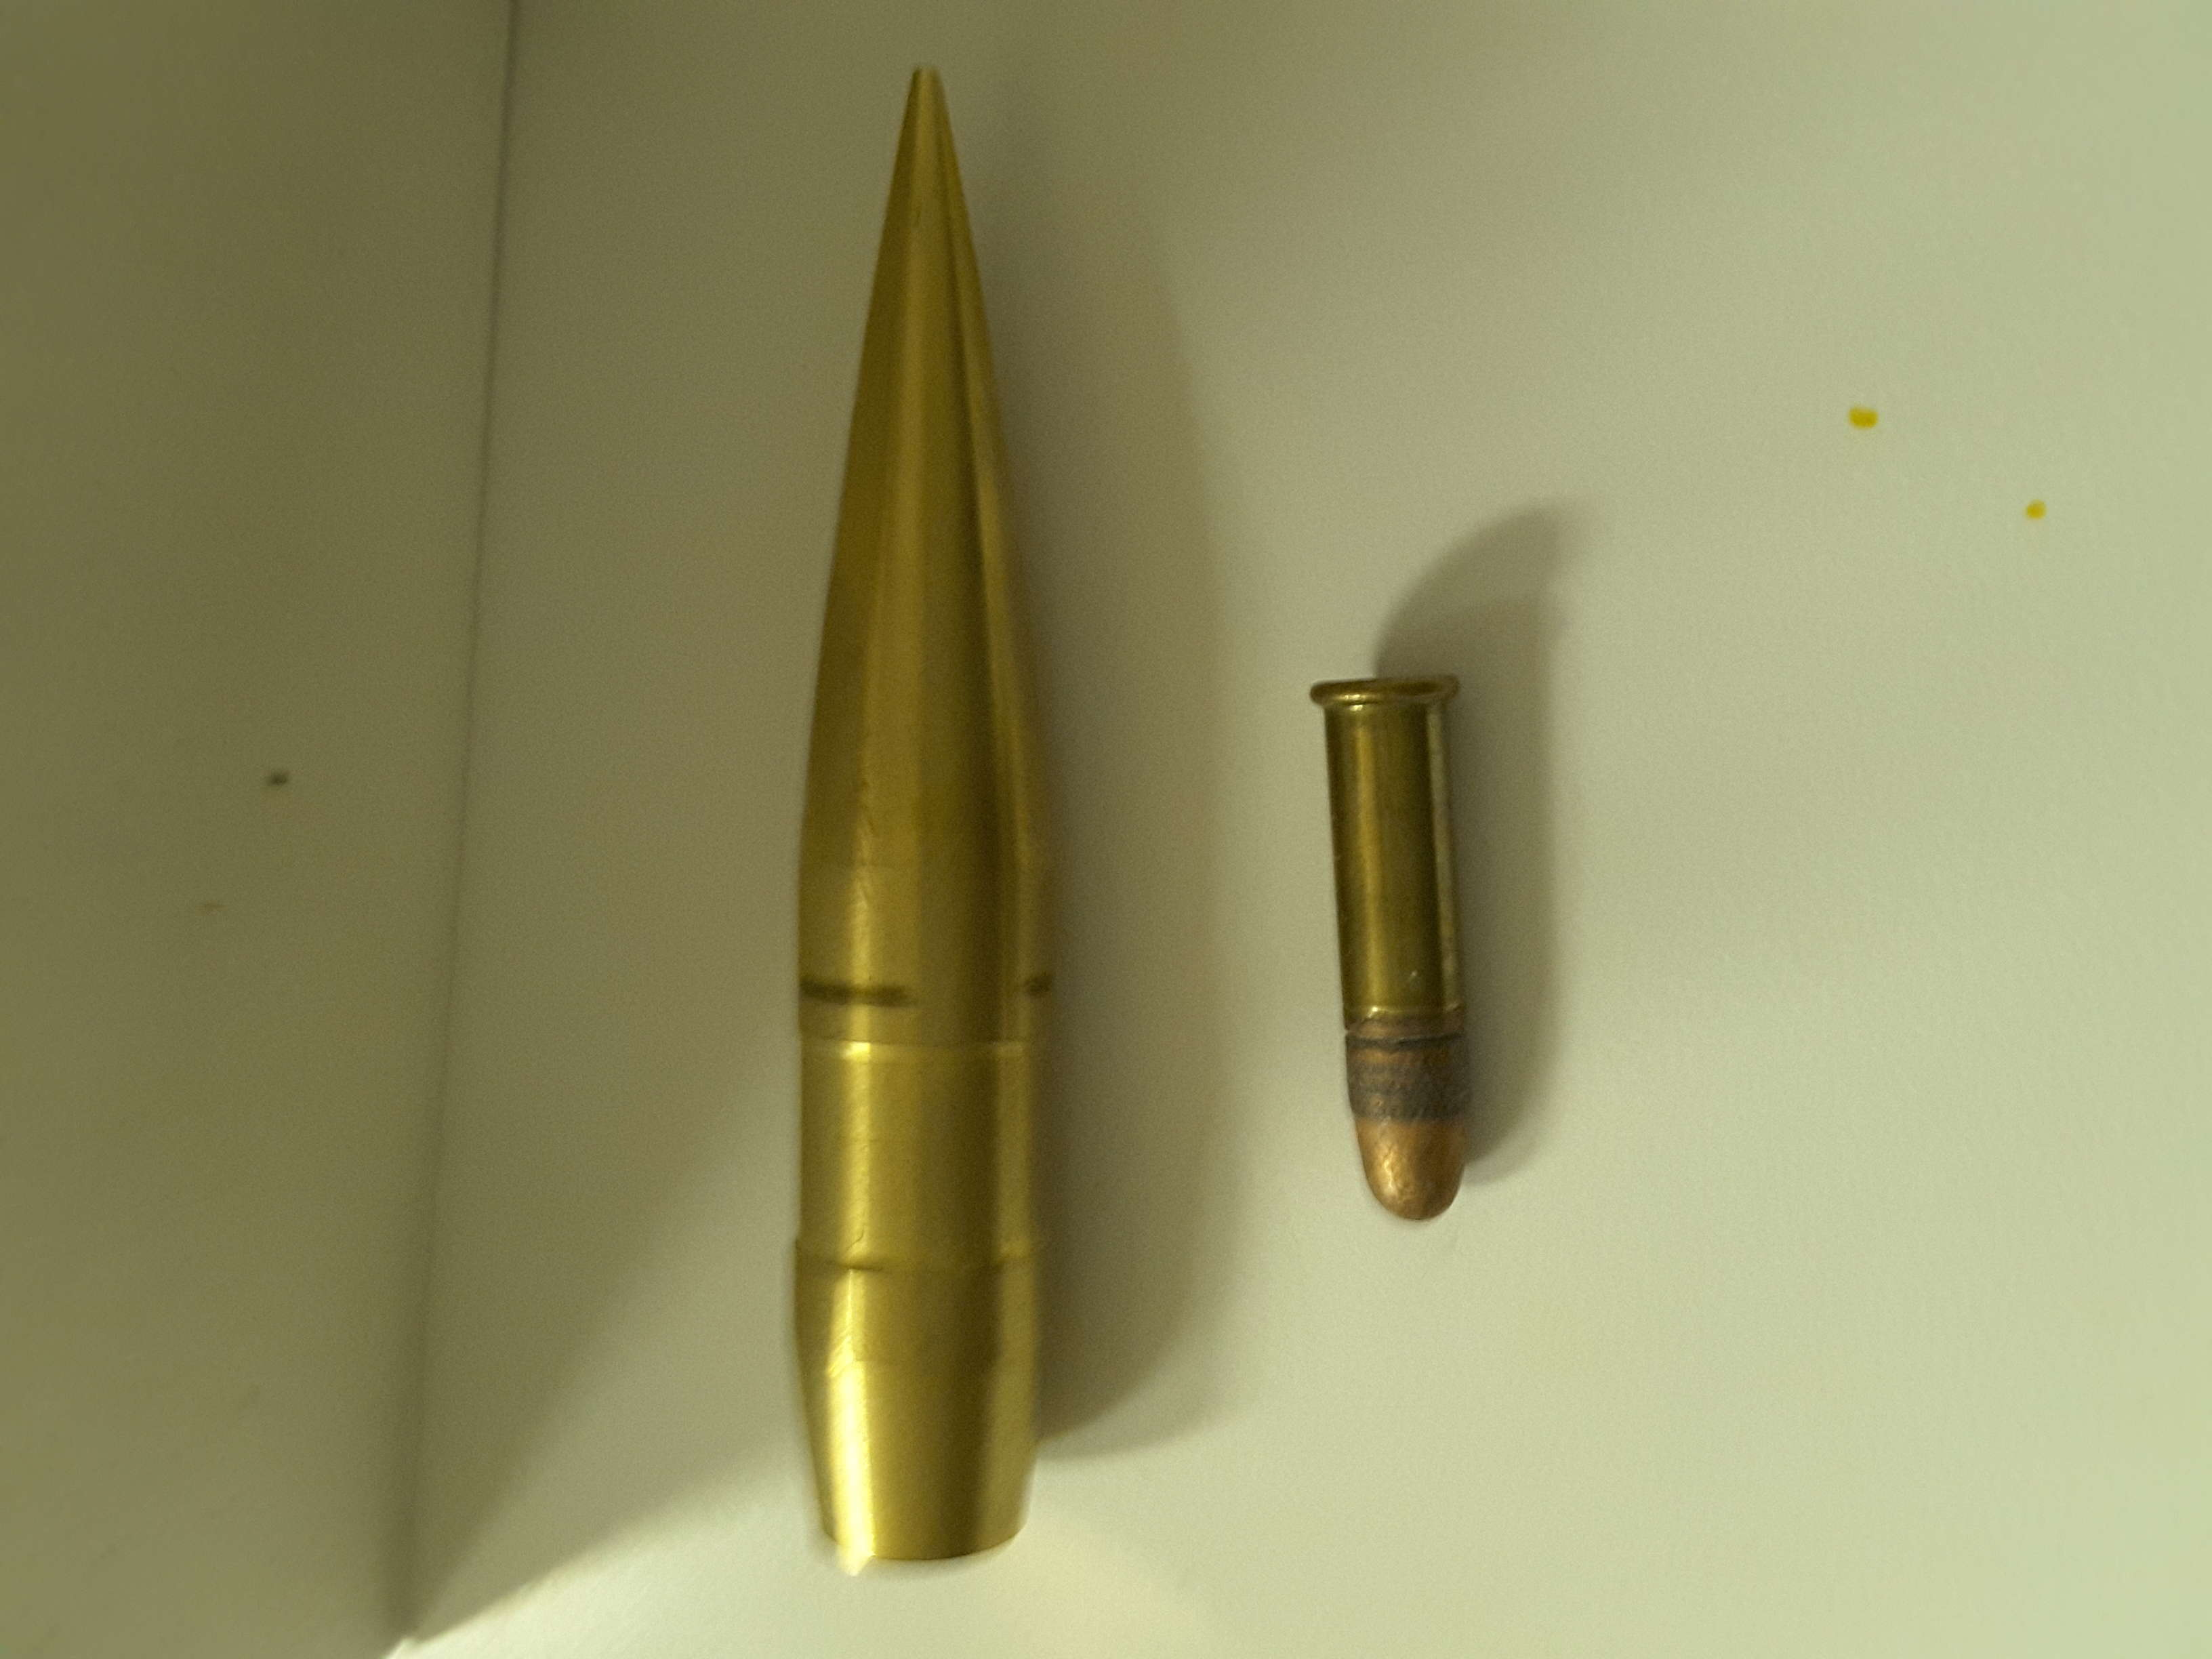 Barnes 50 BMG Bullets - 24hourcampfire